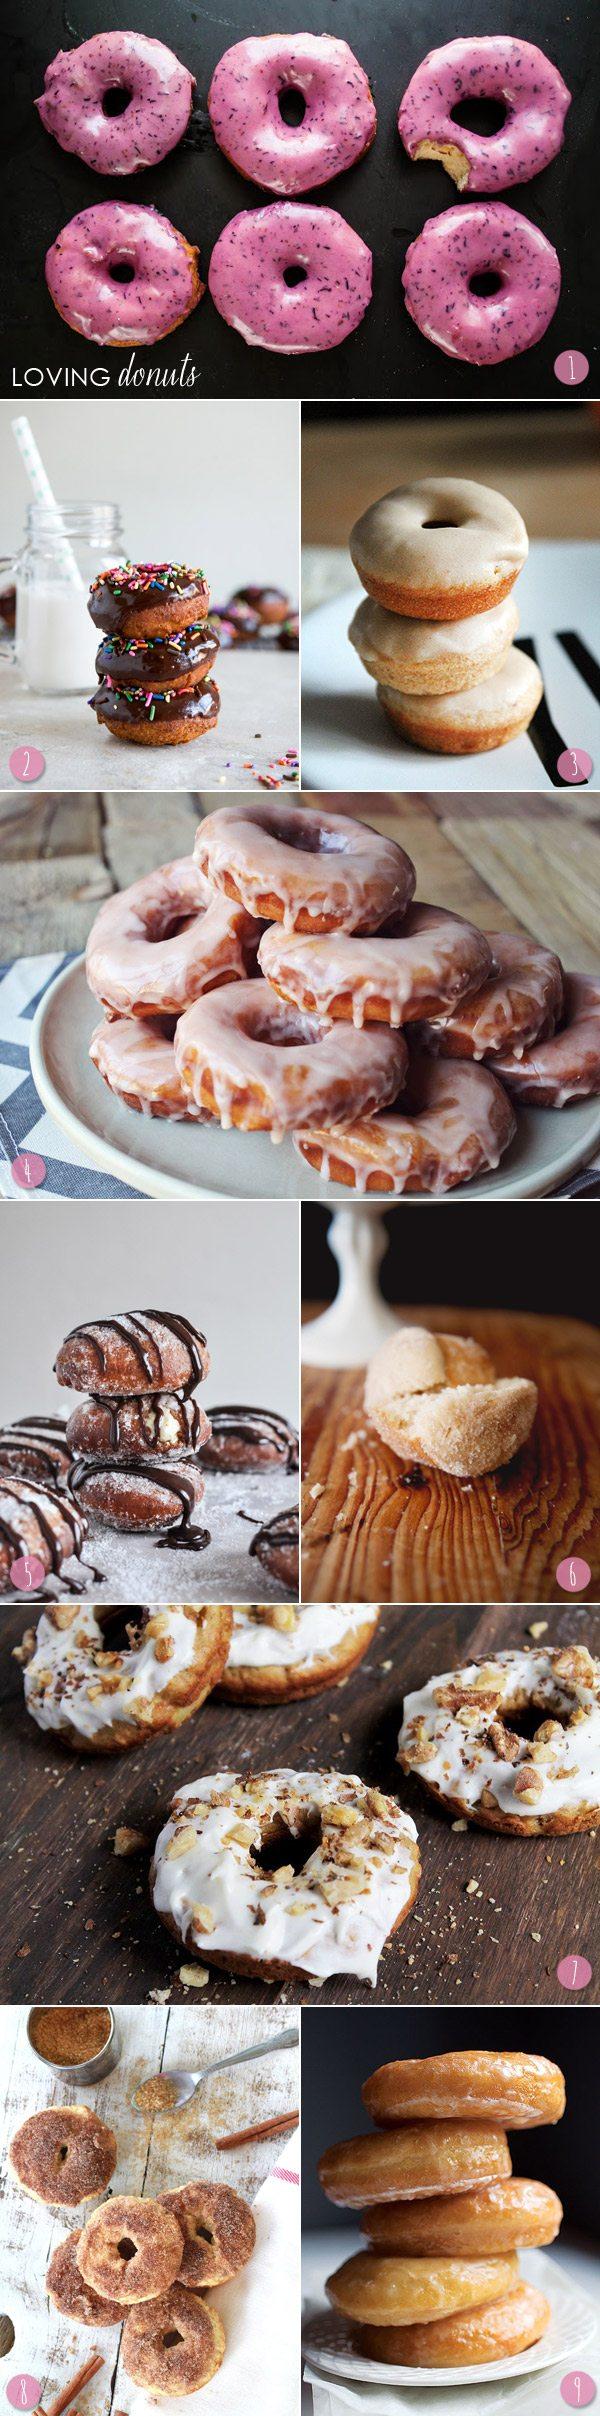 Loving Homemade Donuts